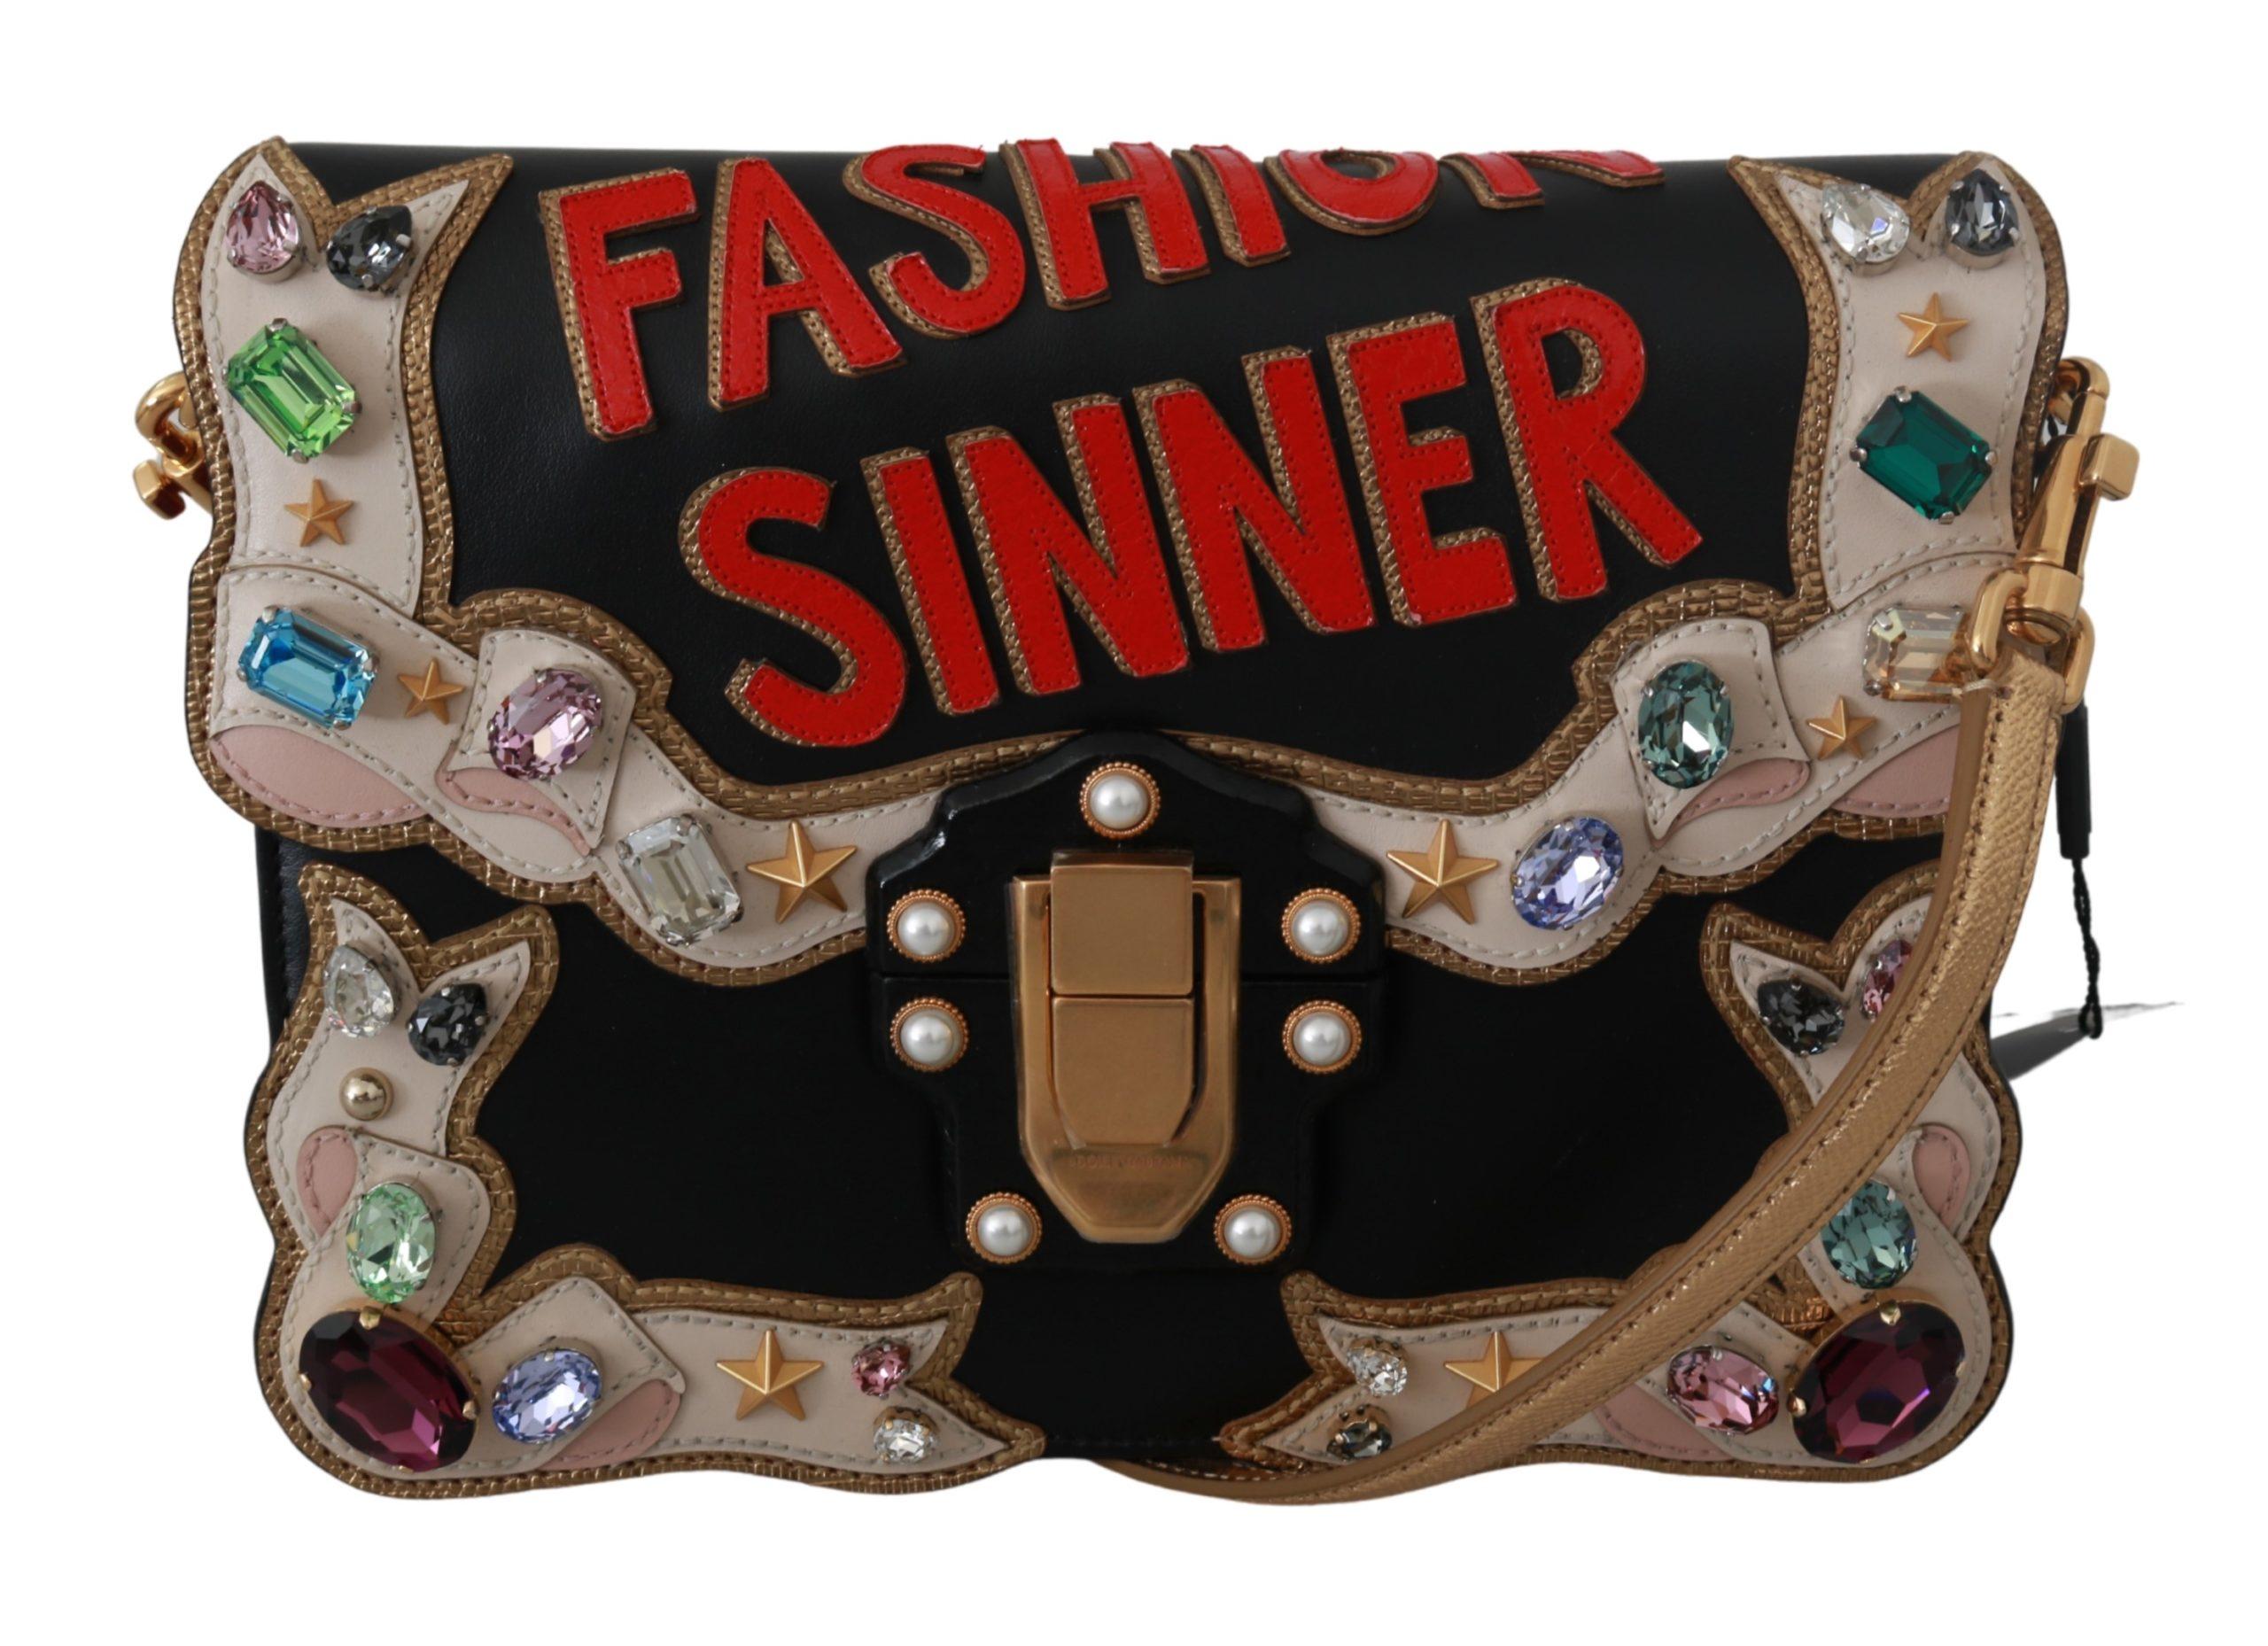 Black Leather Crystal Fashion Sinner Borse LUCIA Purse